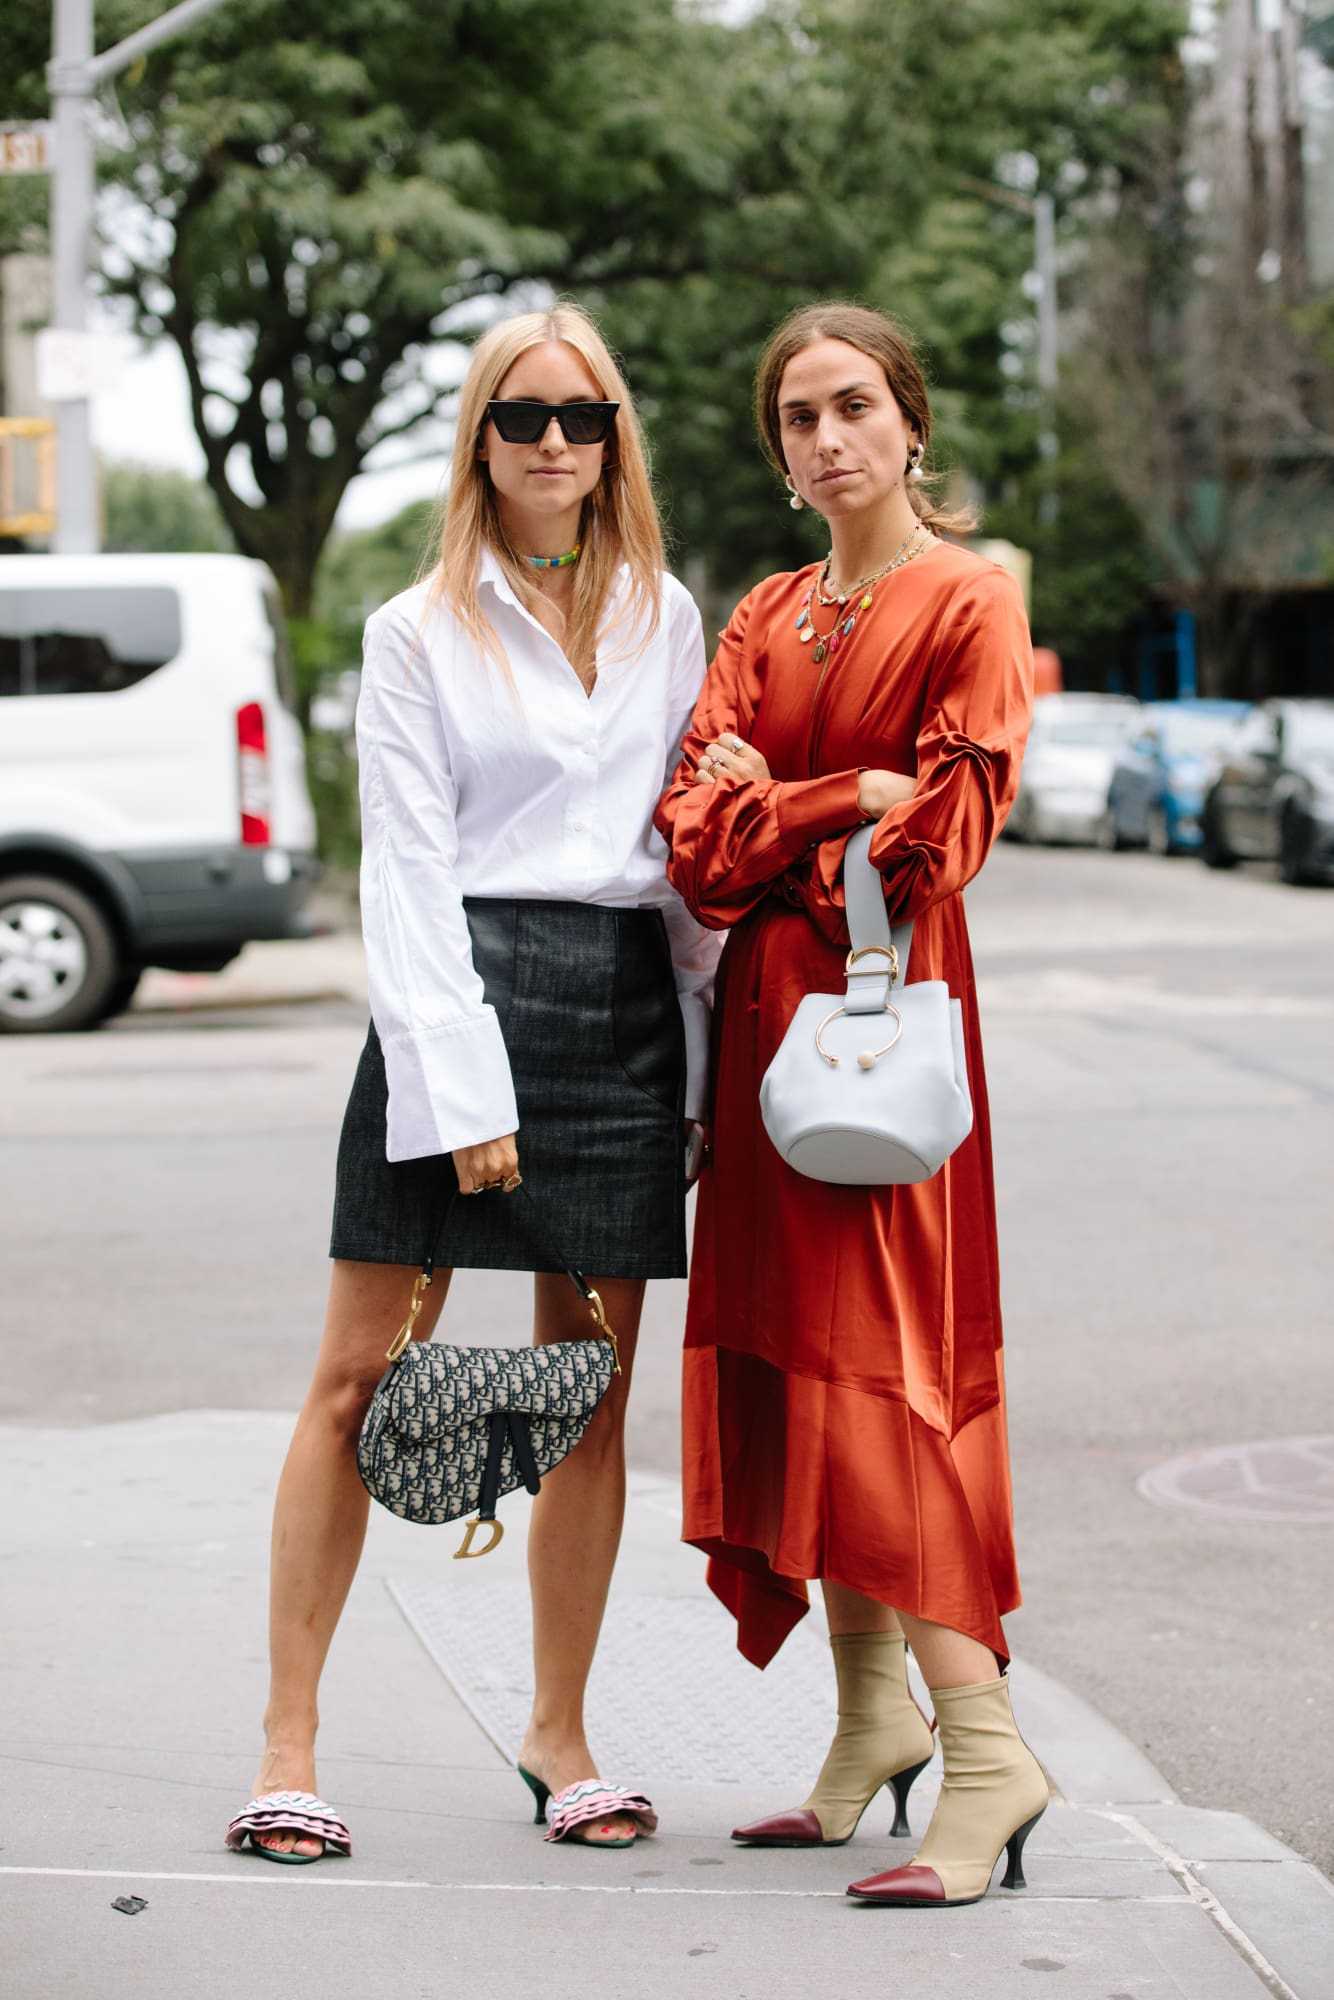 new-york-fashion-week-street-style-spring-2019-day-3-5.jpg